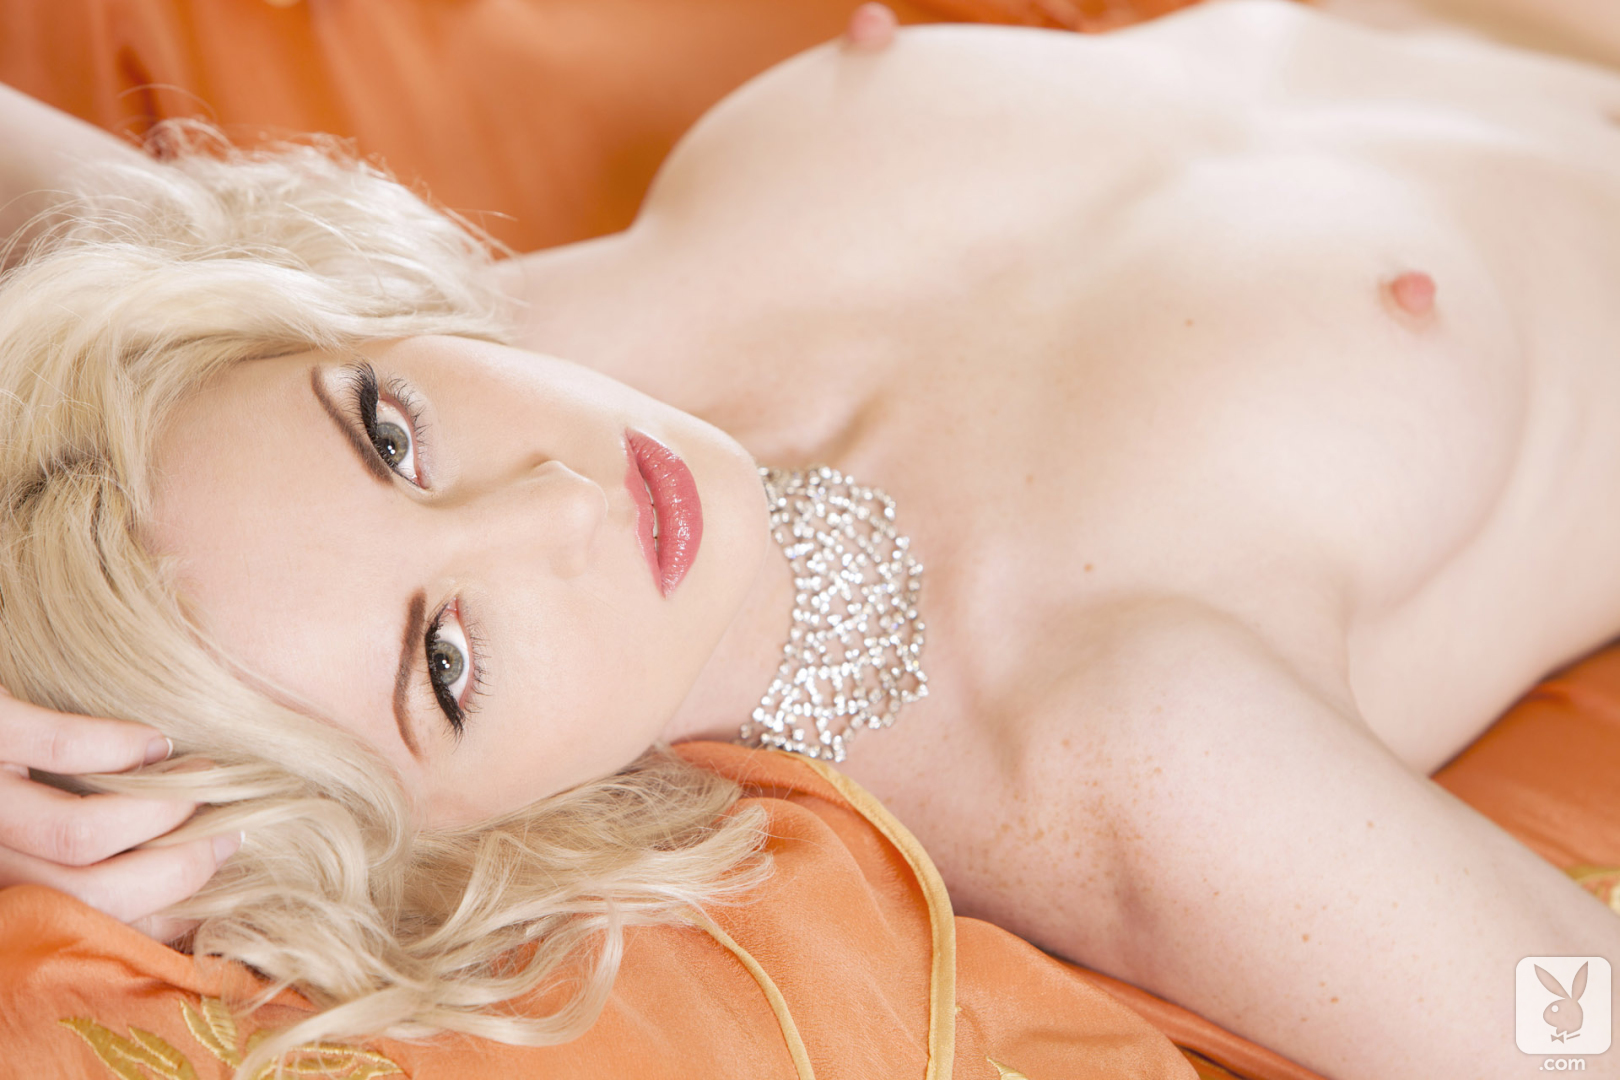 Playboy : Hot blond Playboy pet Carissa White